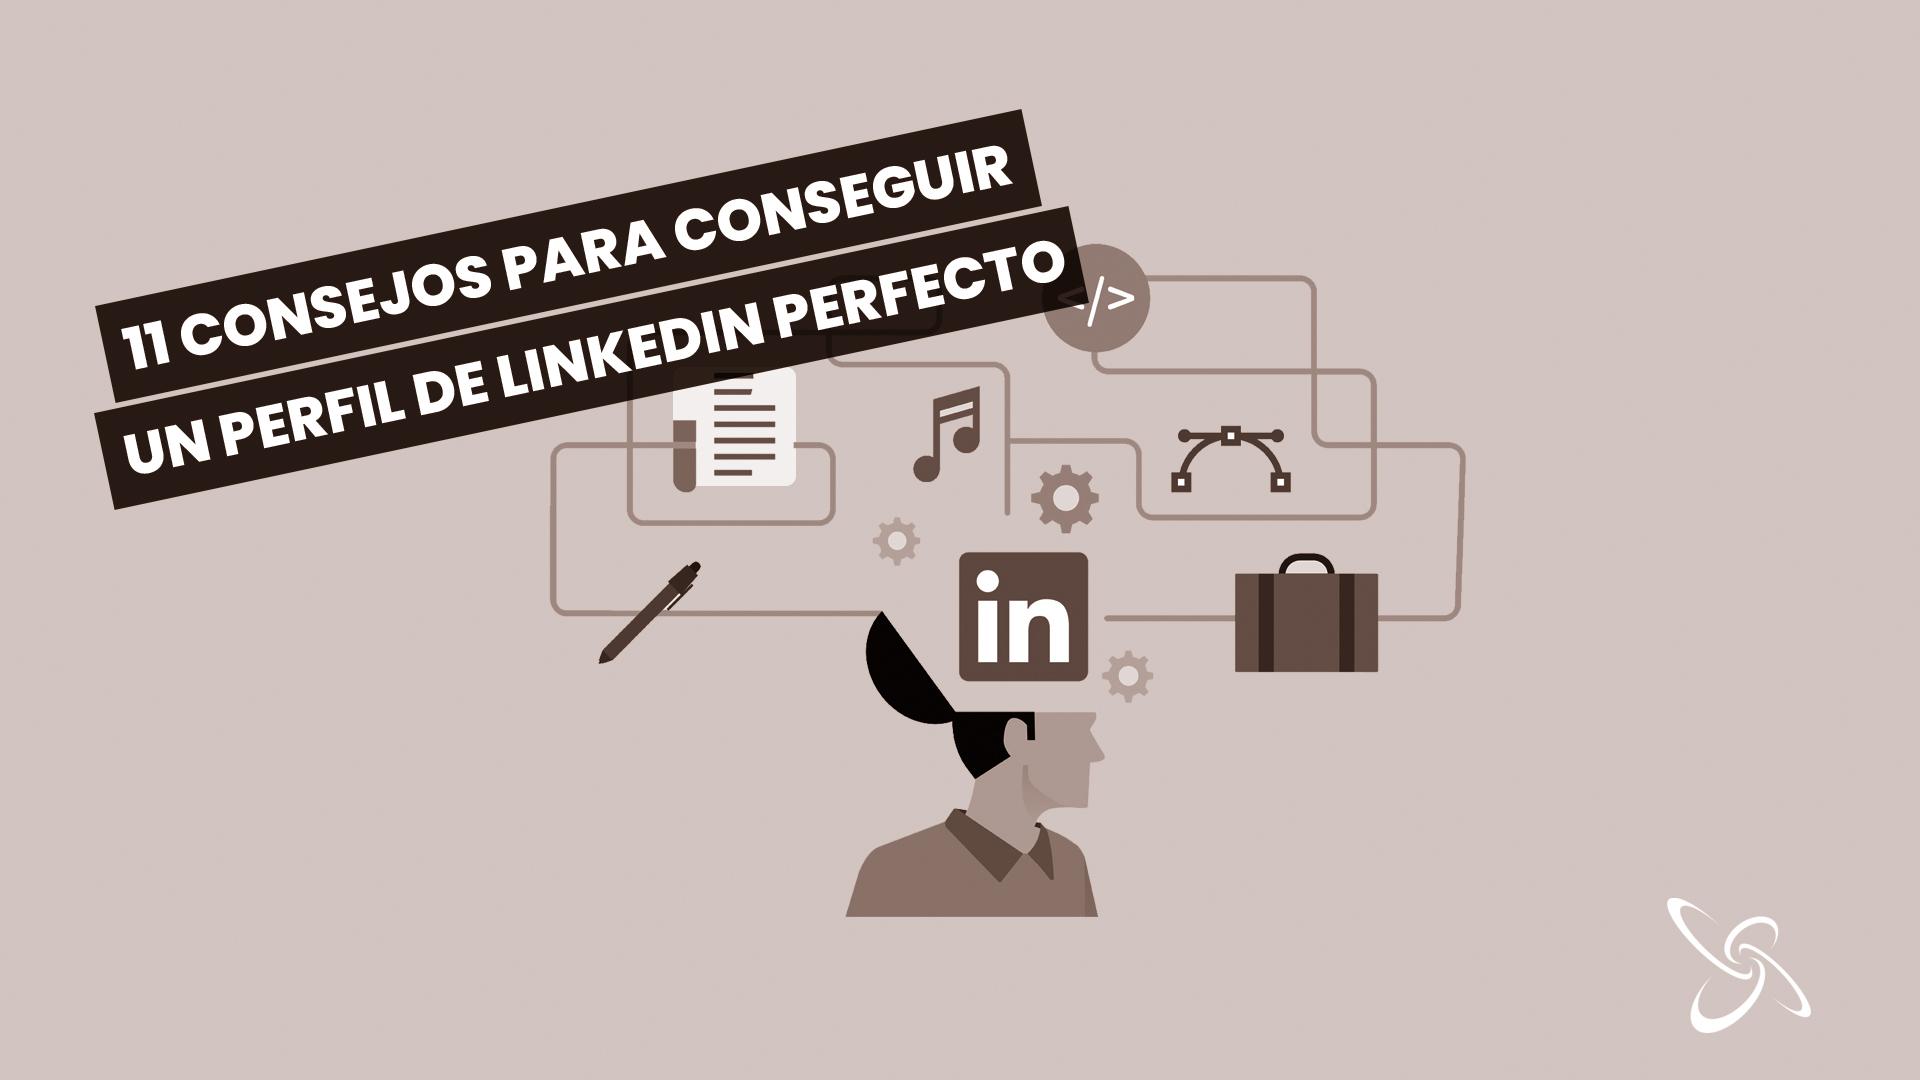 11 consejos para conseguir un perfil de linkedin perfecto